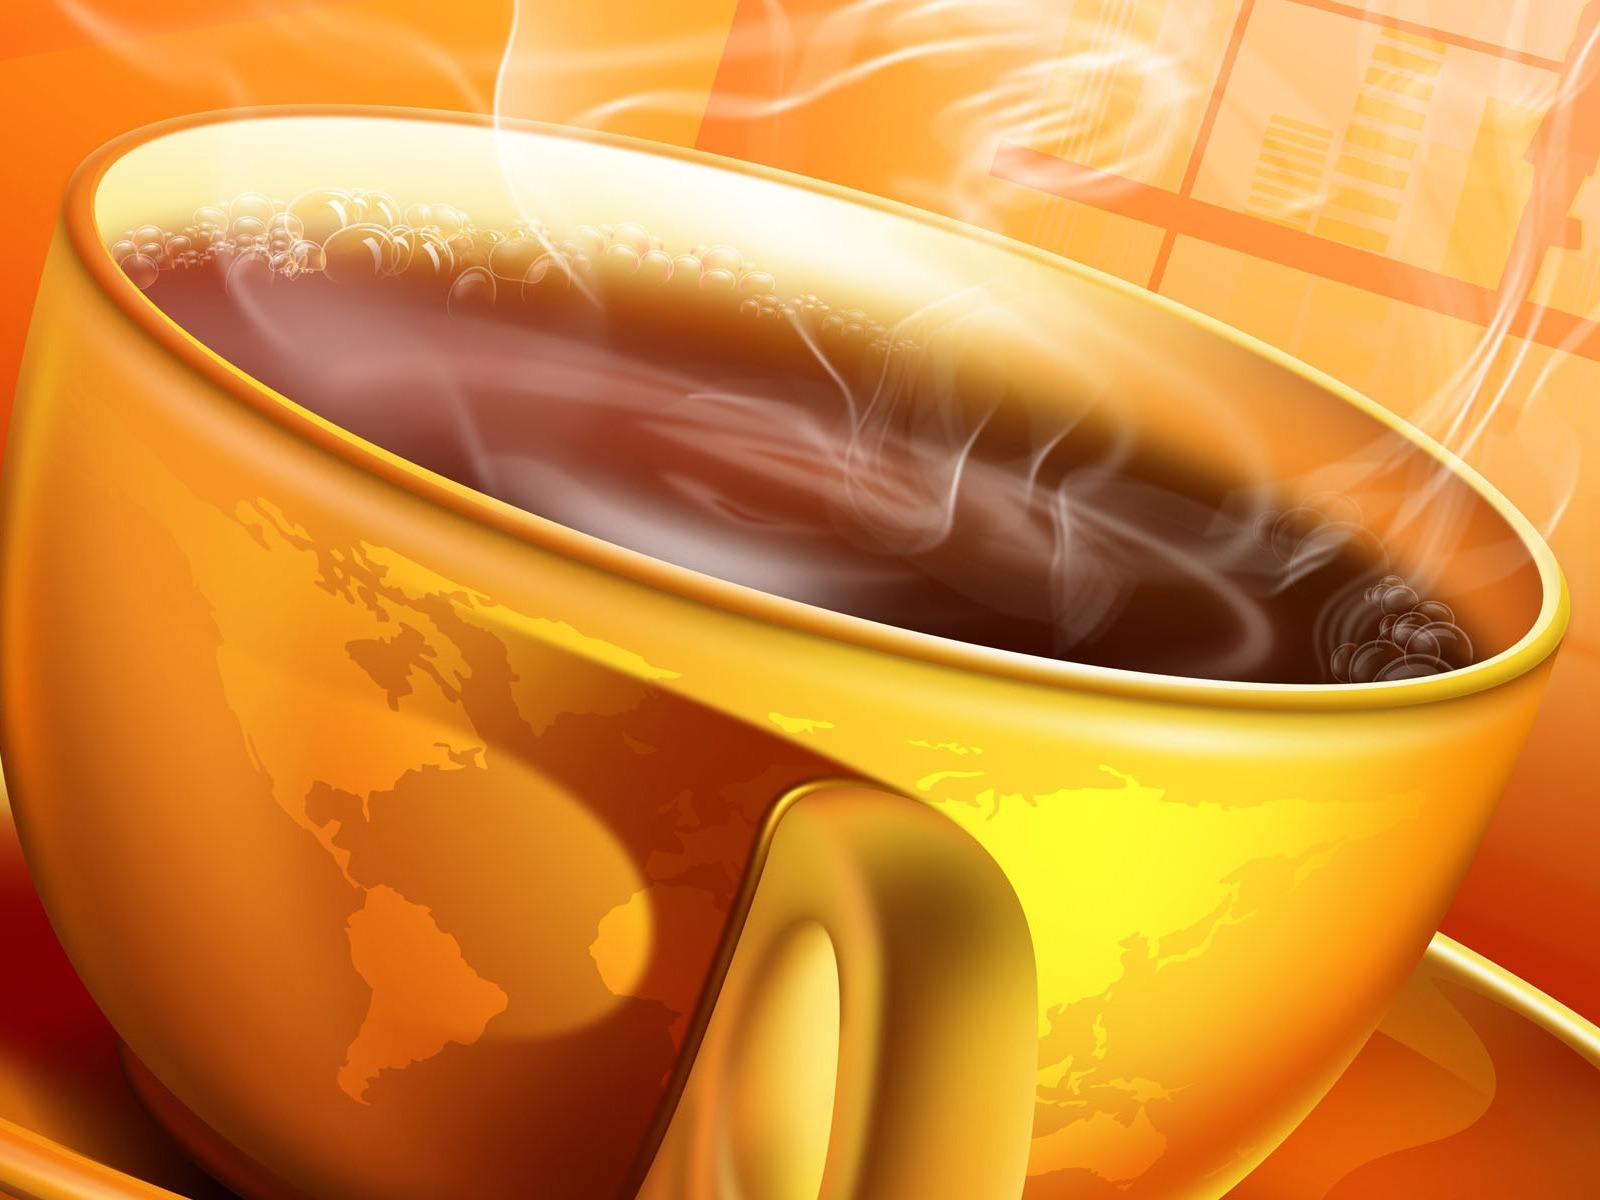 http://2.bp.blogspot.com/-k8nmknrfaPk/TscktkCmgXI/AAAAAAAANL8/4VTPebDaqVk/s1600/3D_Coffee_cup_1600%2Bx%2B1200.jpg